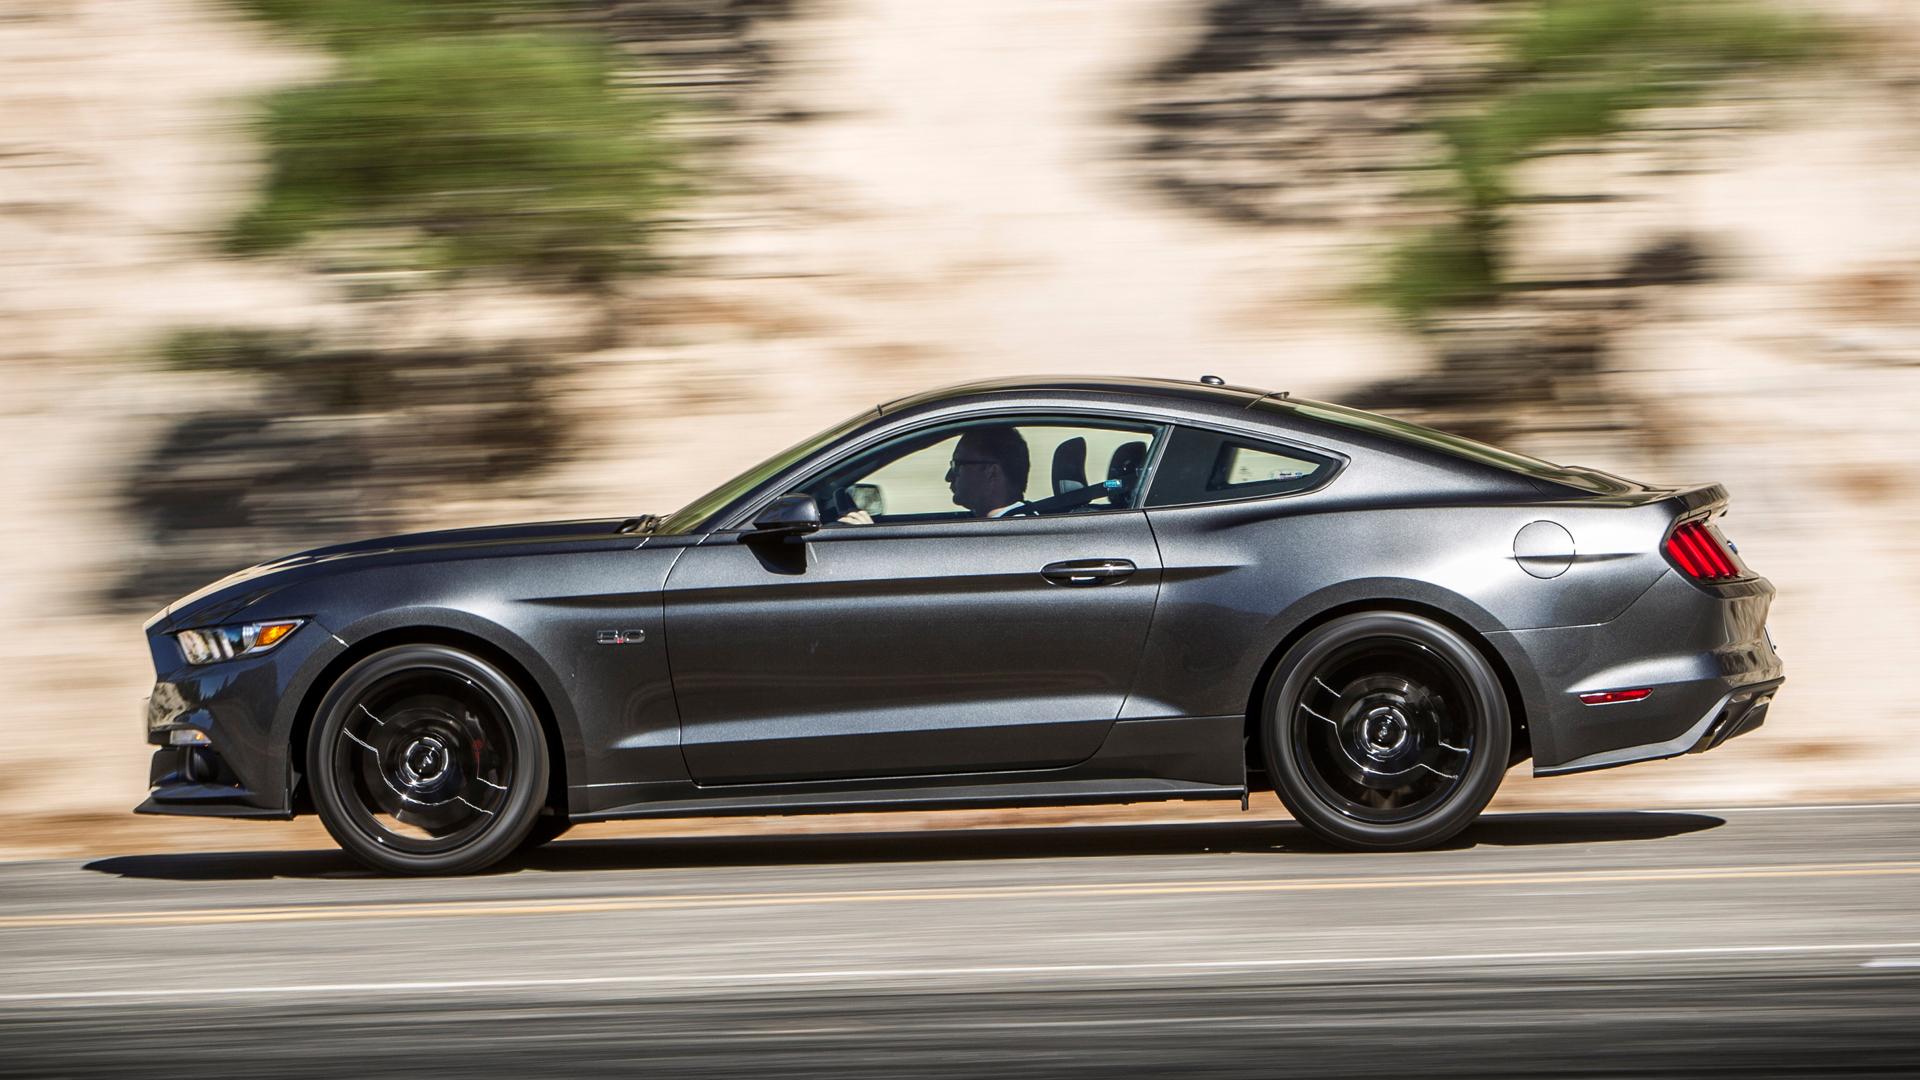 Cool 2015 Mustang GT Wallpaper 1920x1080